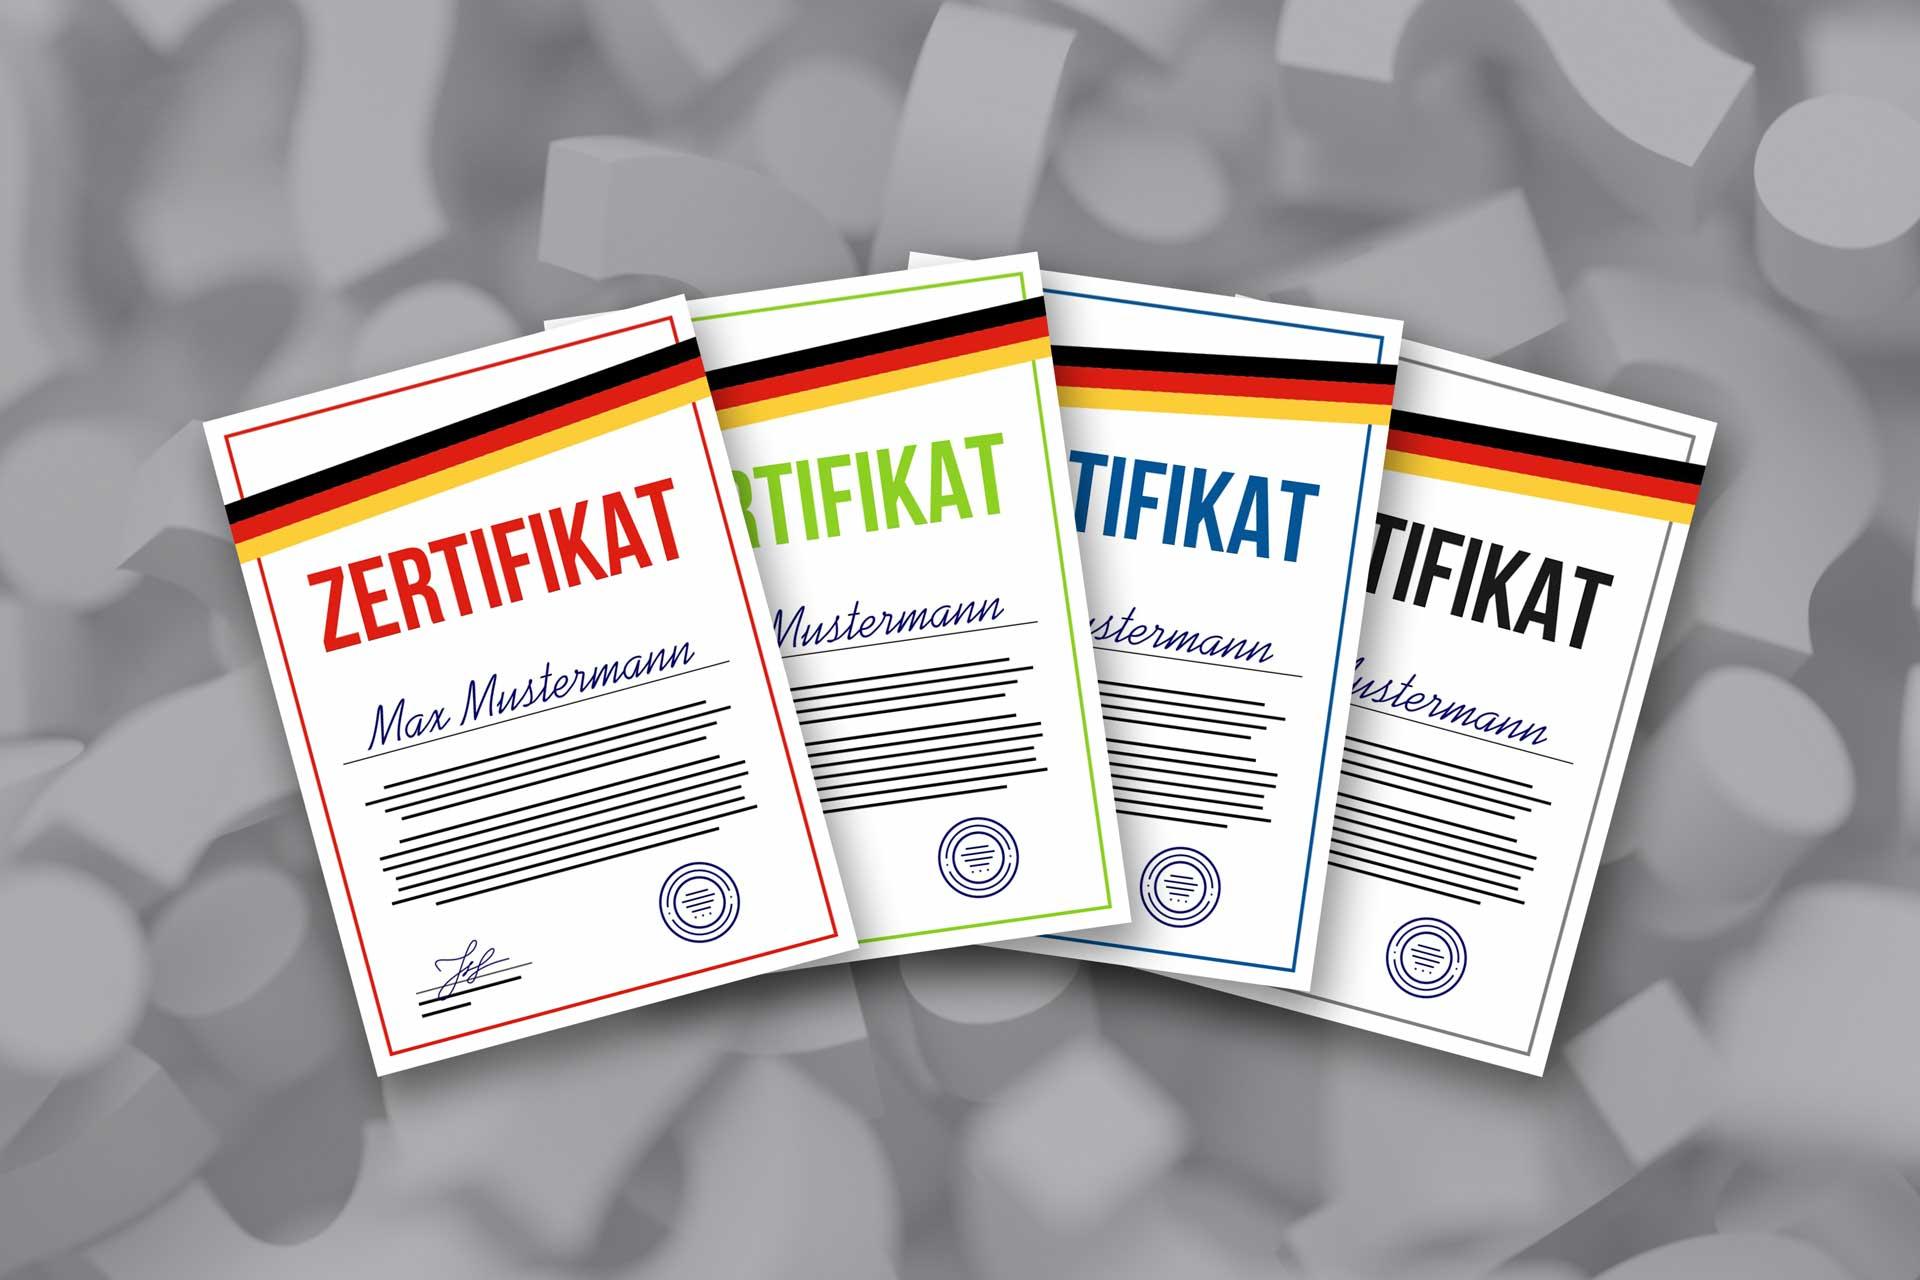 Zertifikate Telc Daf Dsh Goethe Institut Zertifikat Welches